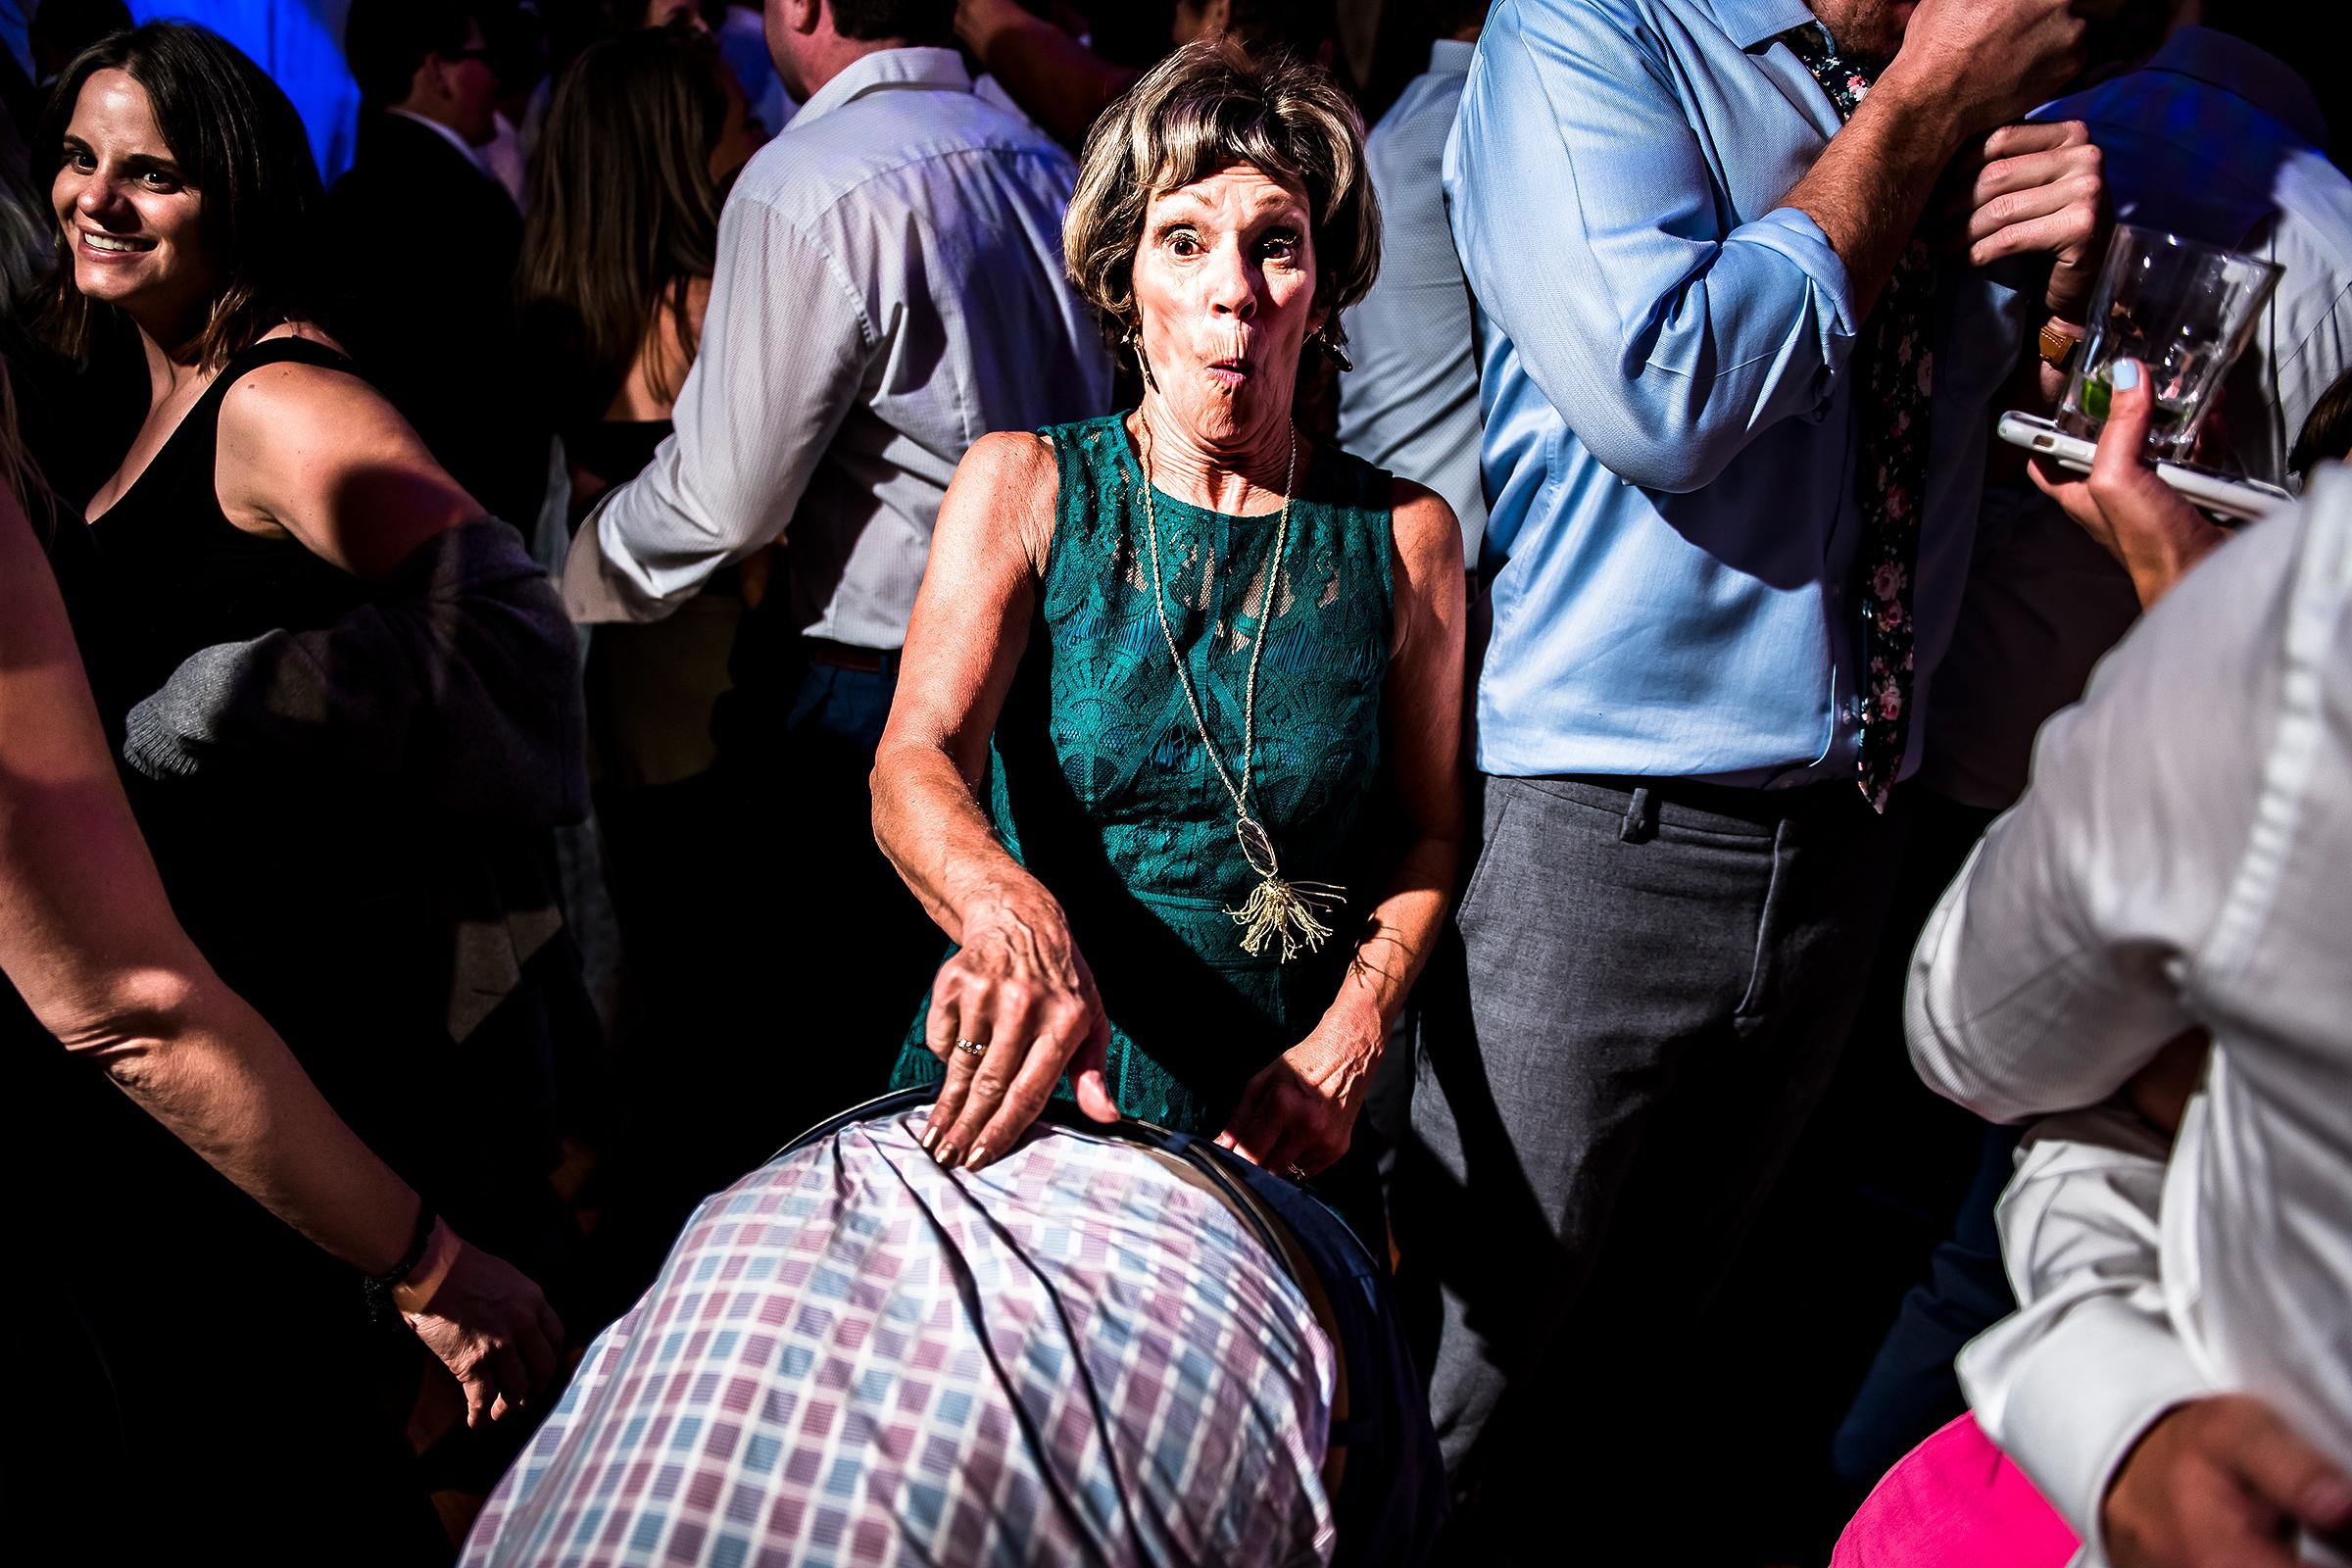 guest-reacts-to-husband-dance-move-photo-by-j-la-plante-photo